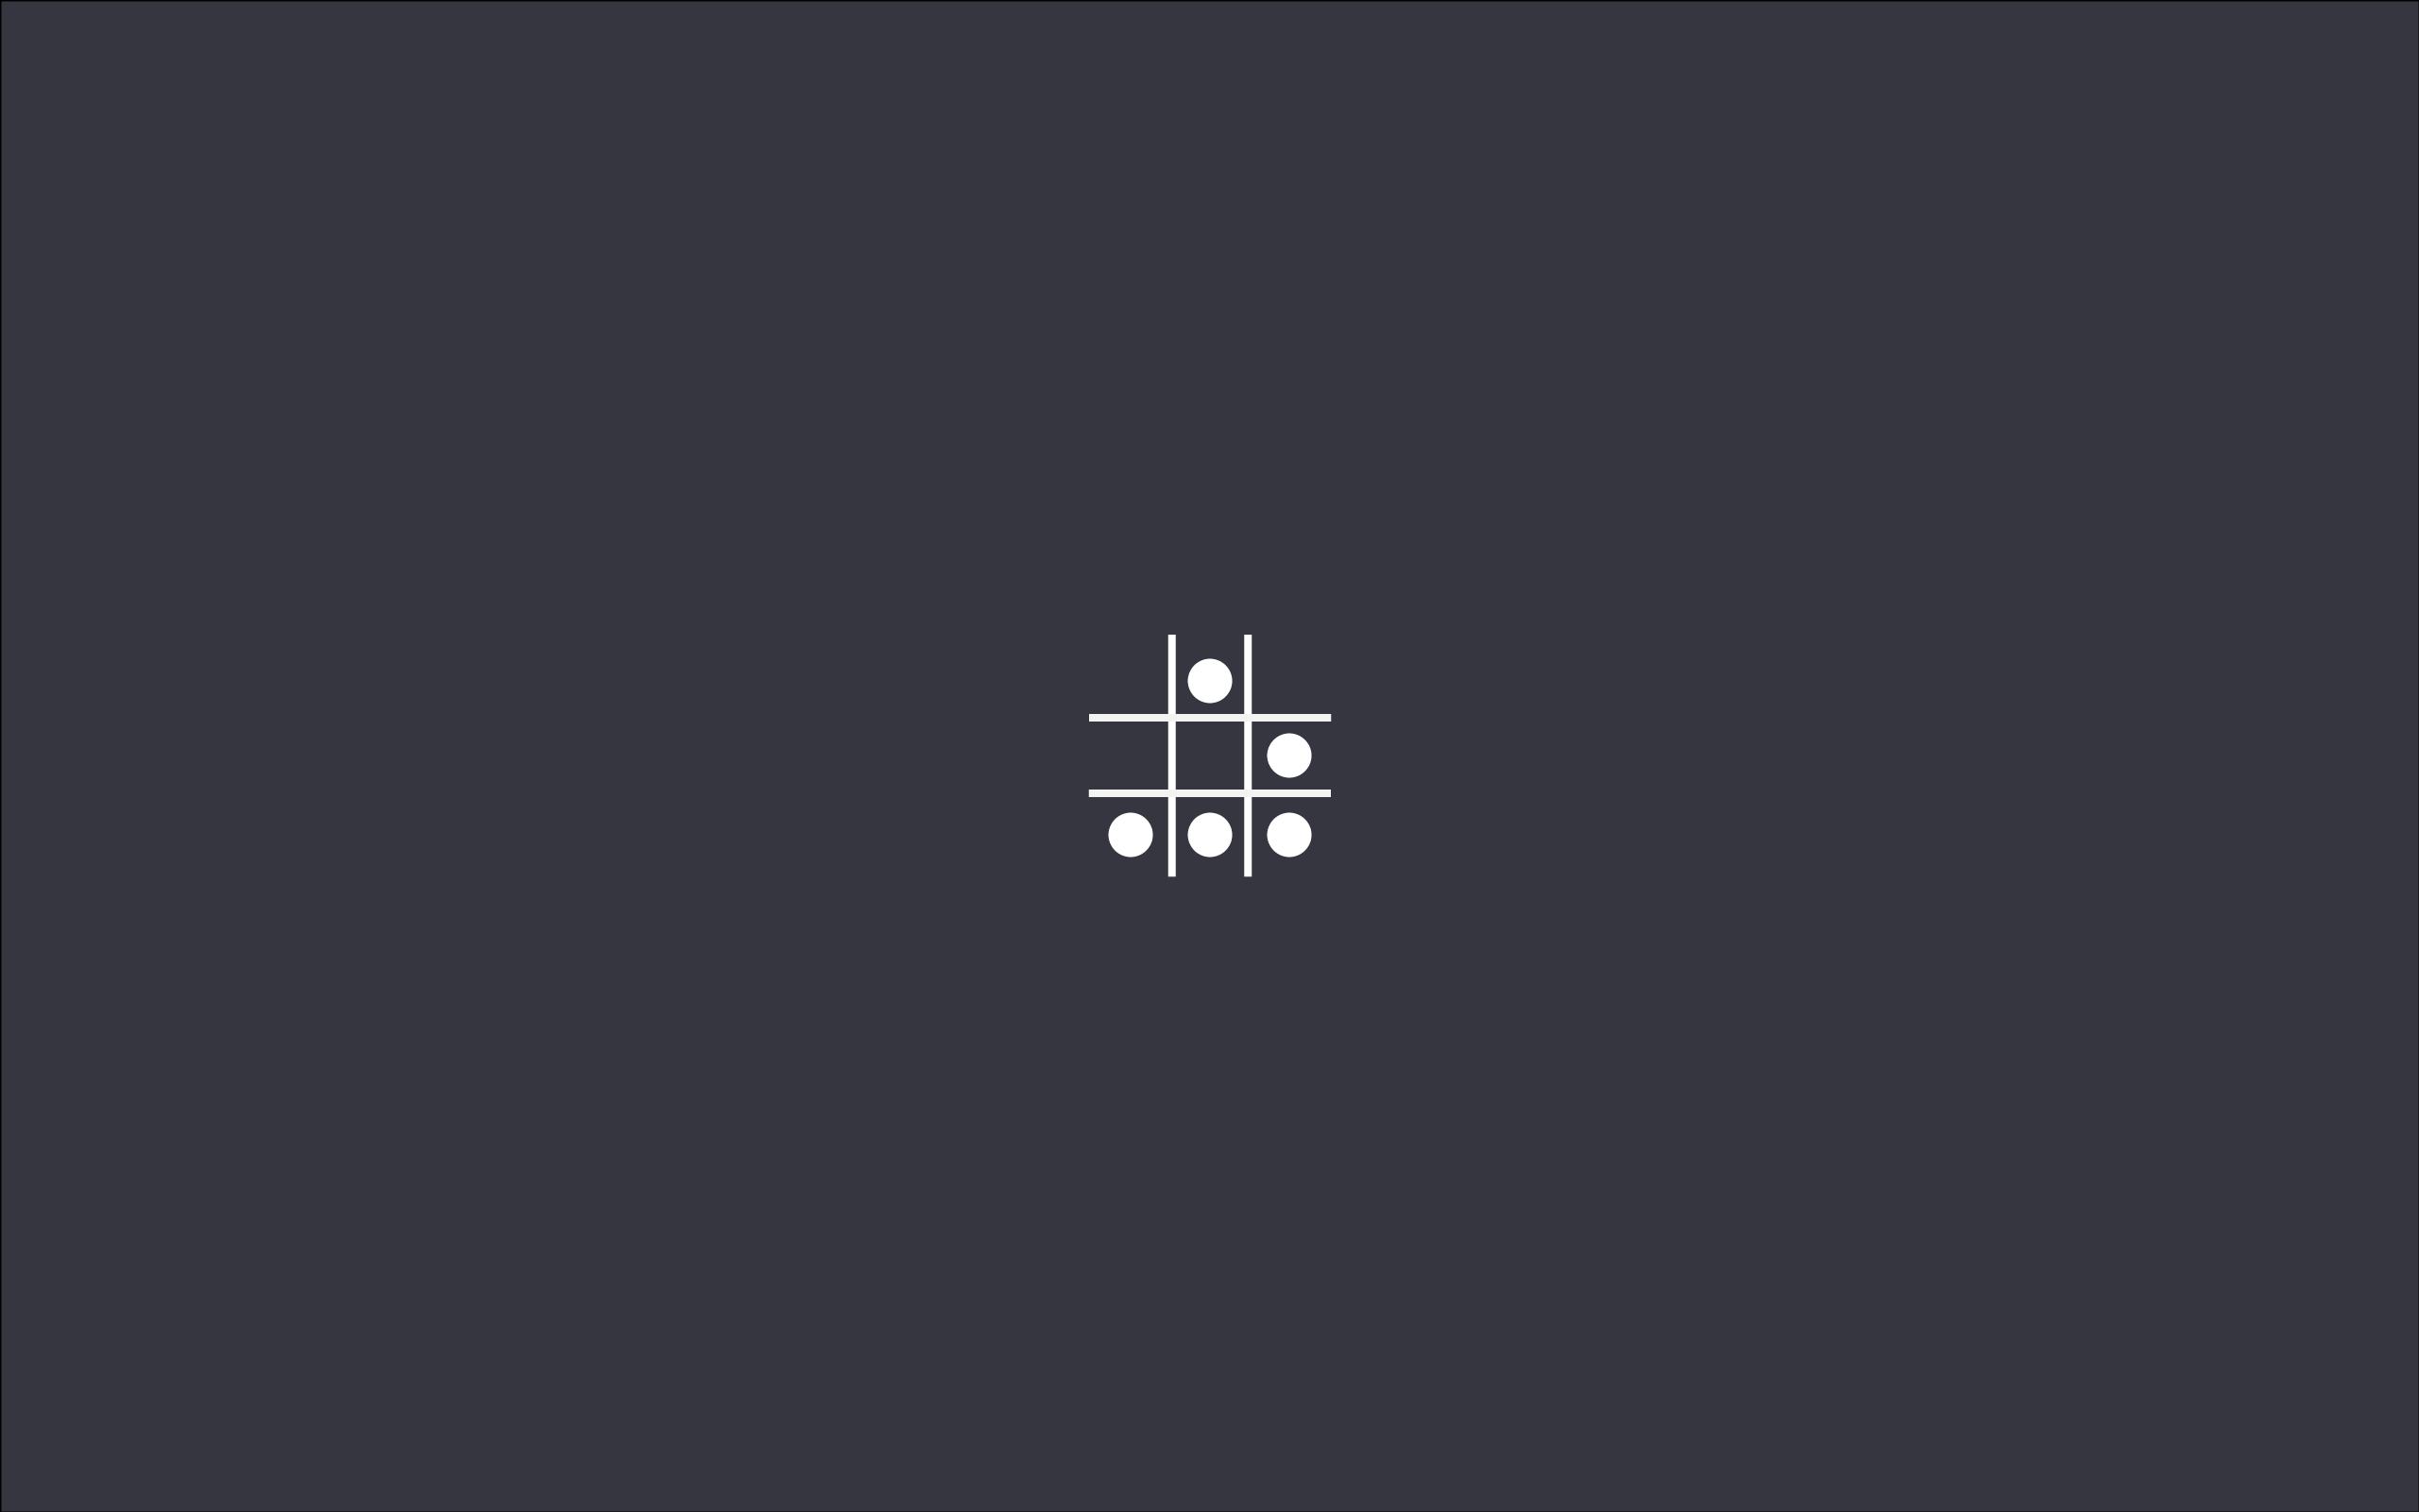 Le Glider – D'où vient ce symbole de la culture hacker ?